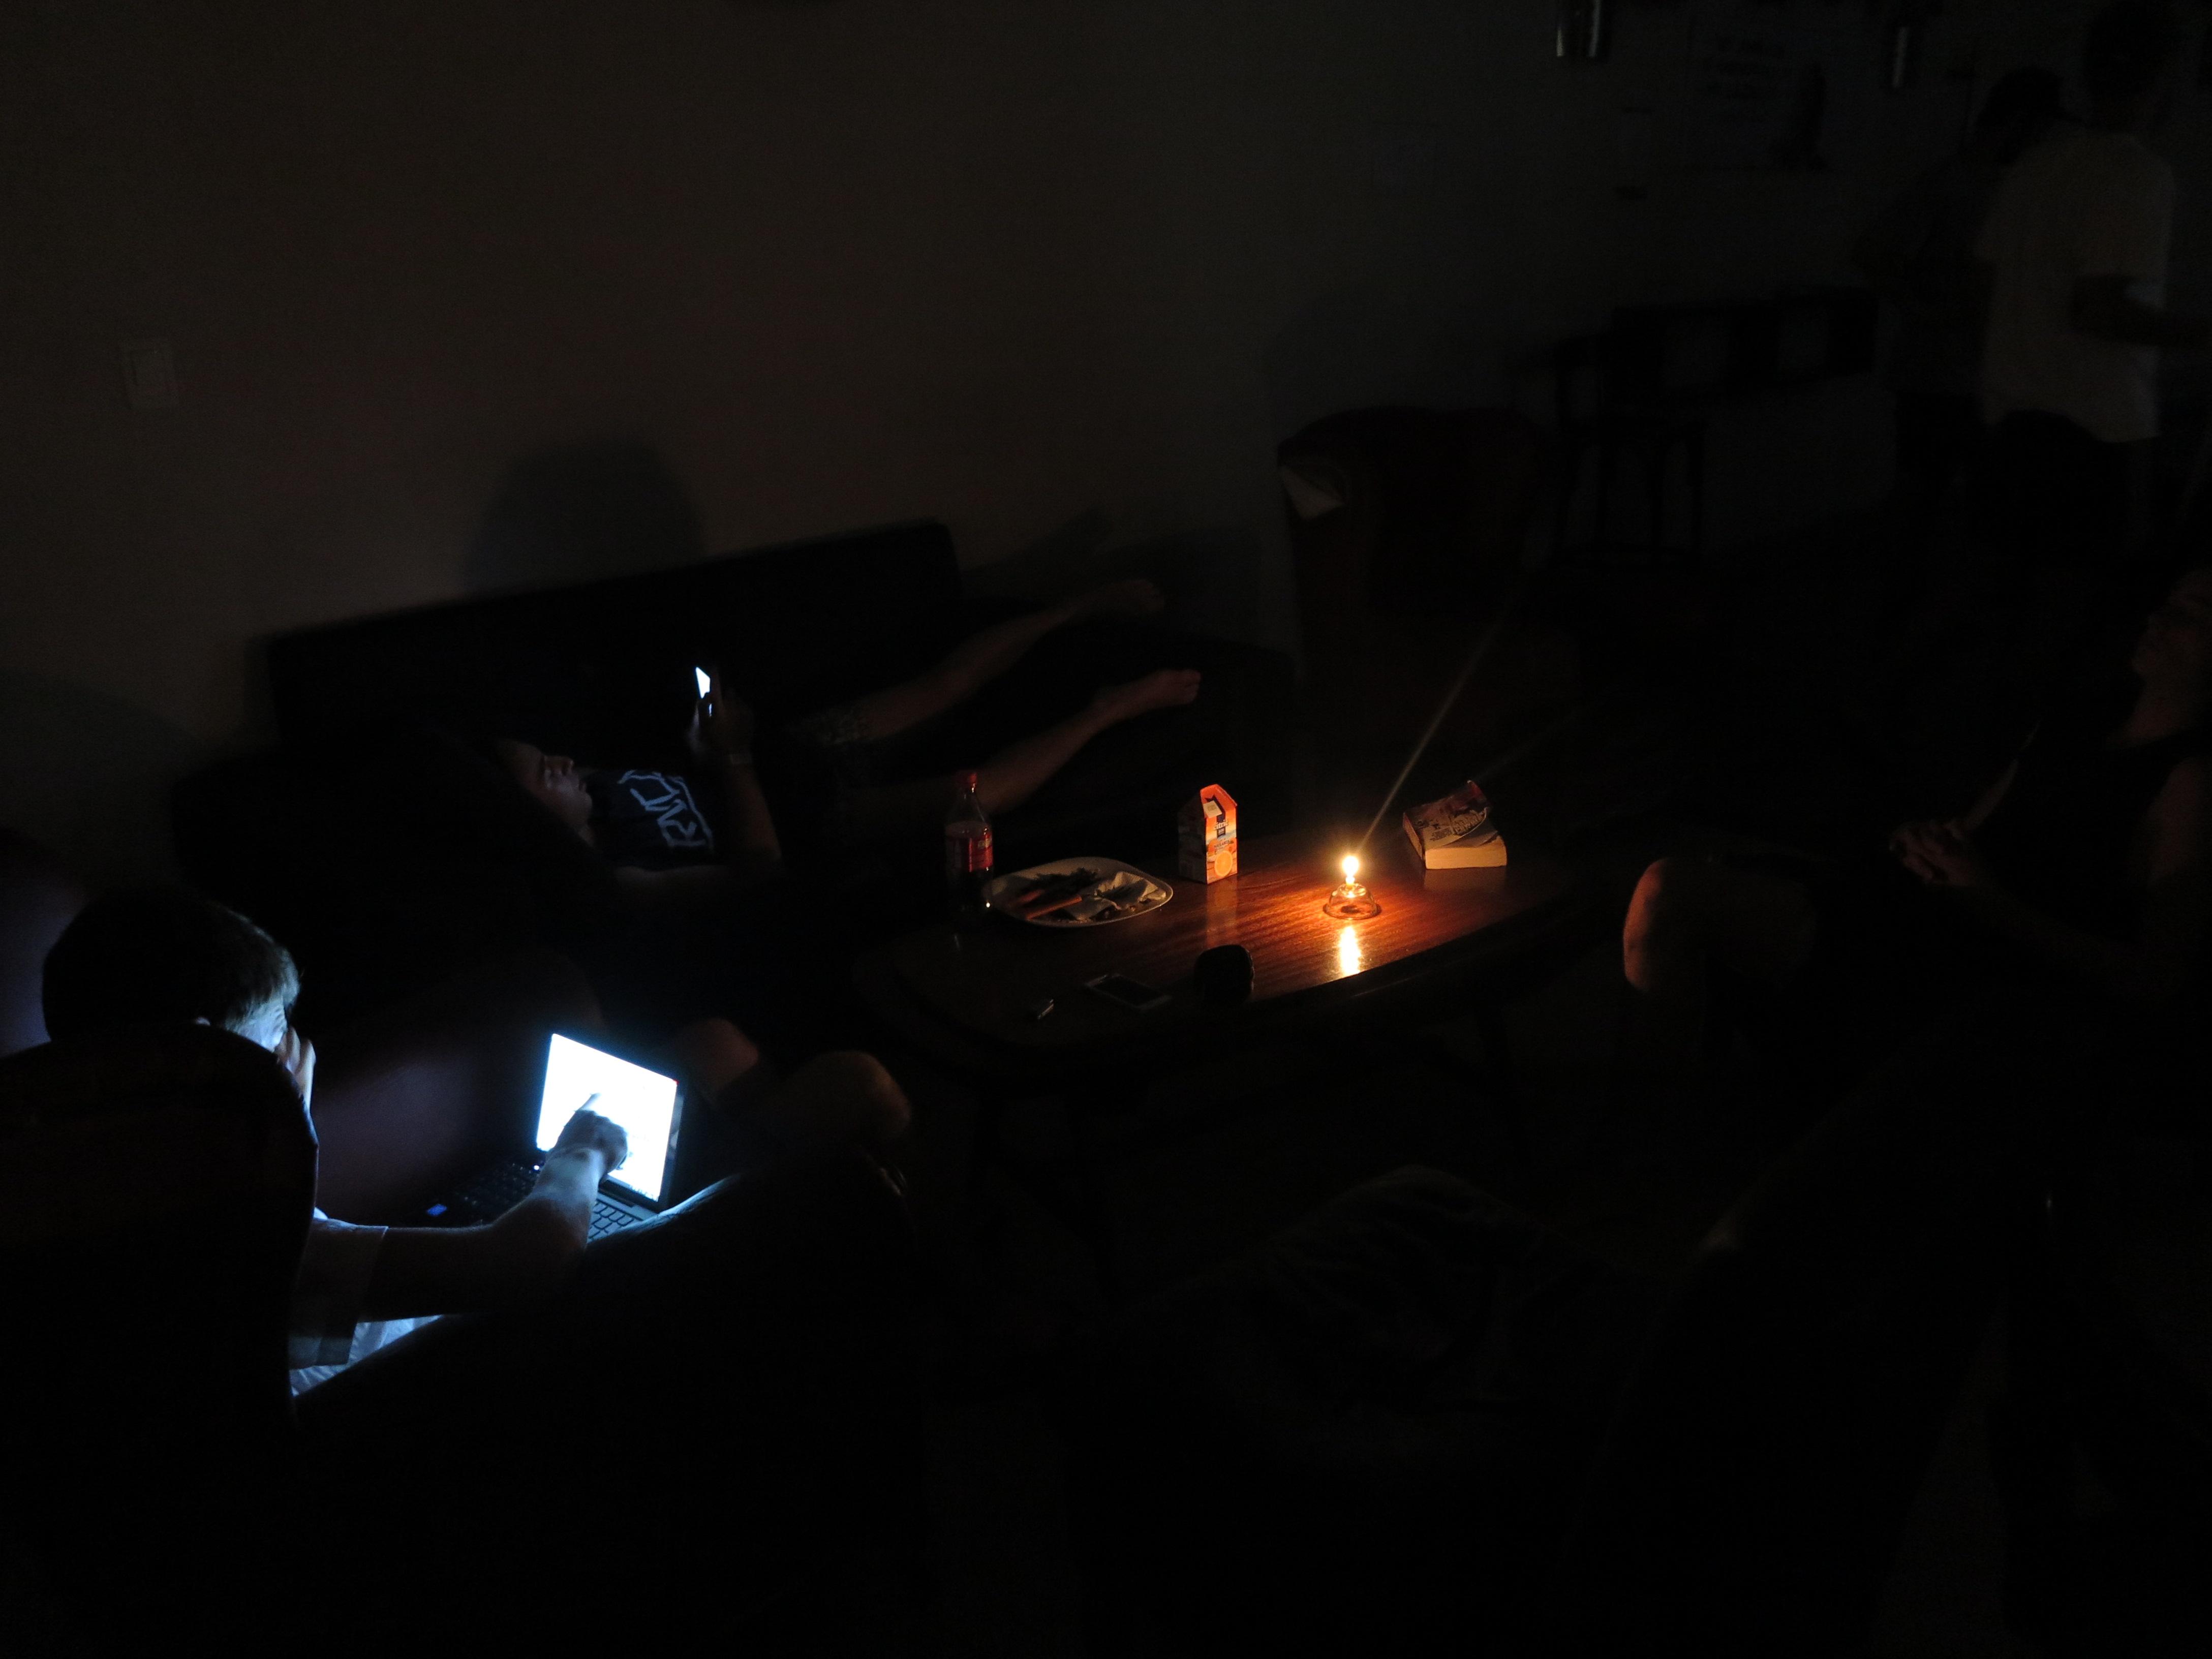 05.12.16 Stromausfall im Hostel